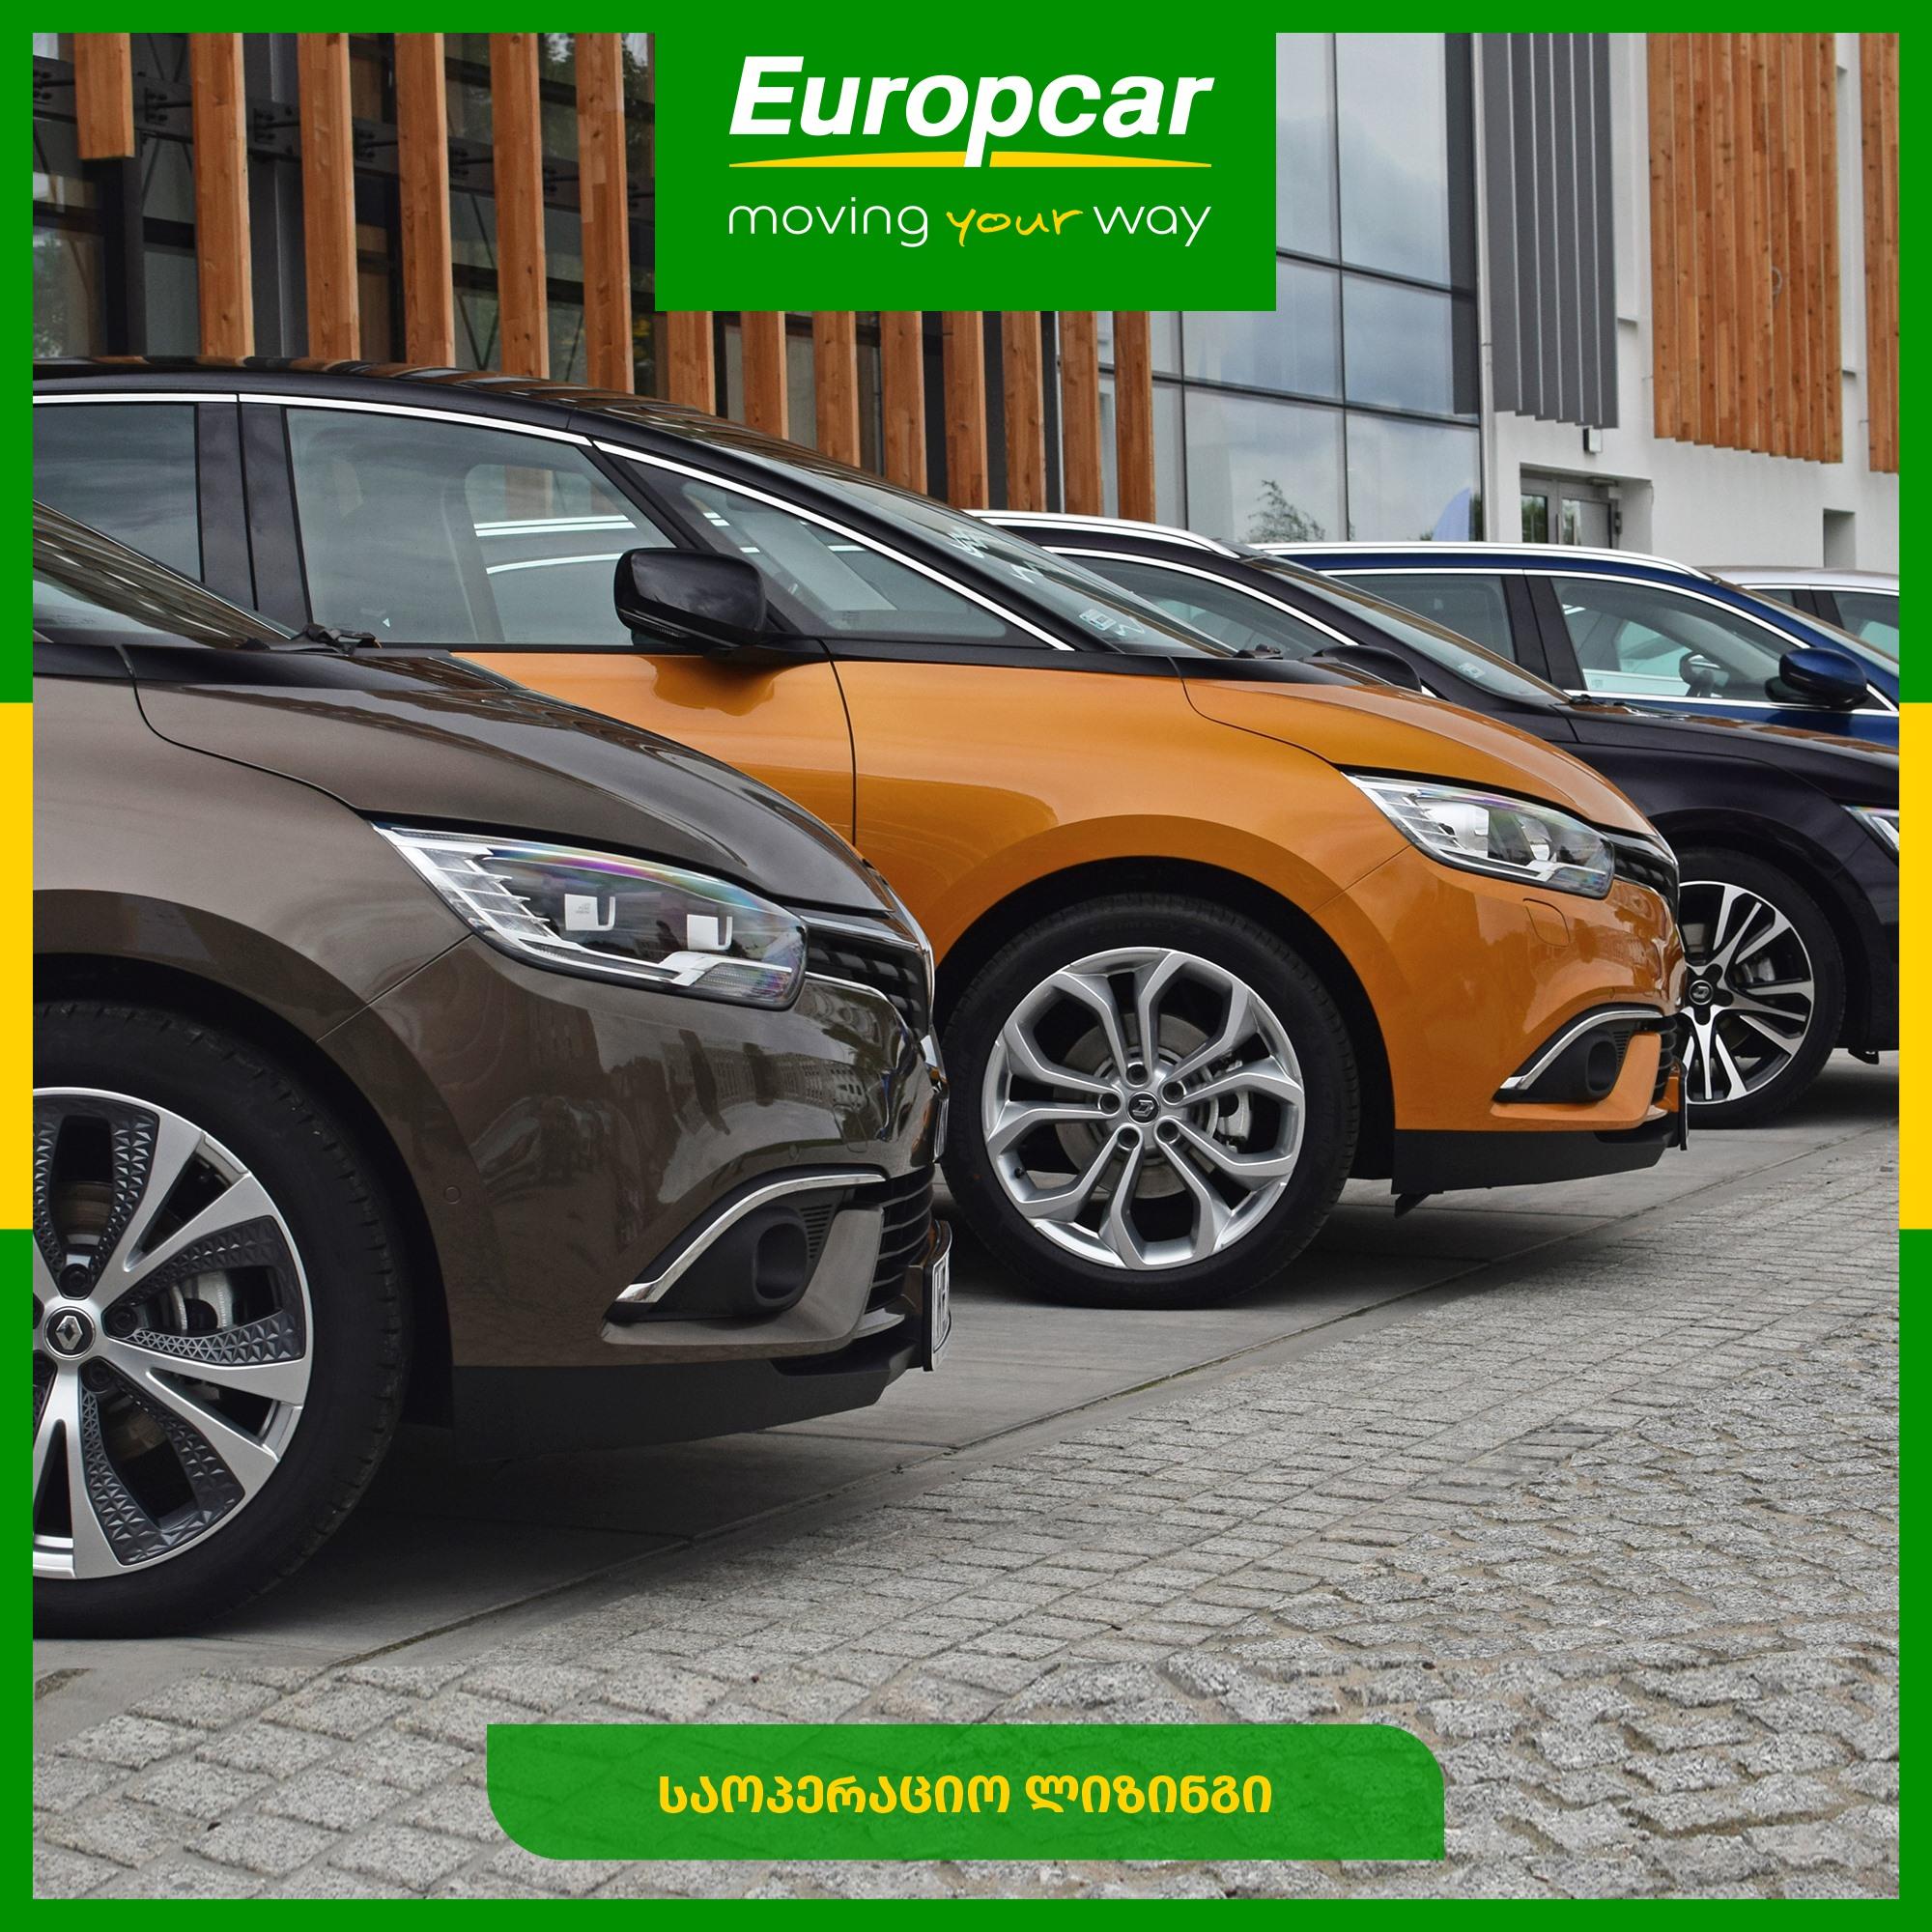 Europcar Georgia კომპანიებს საოპერაციო ლიზინგის მომსახურებას სთავაზობს